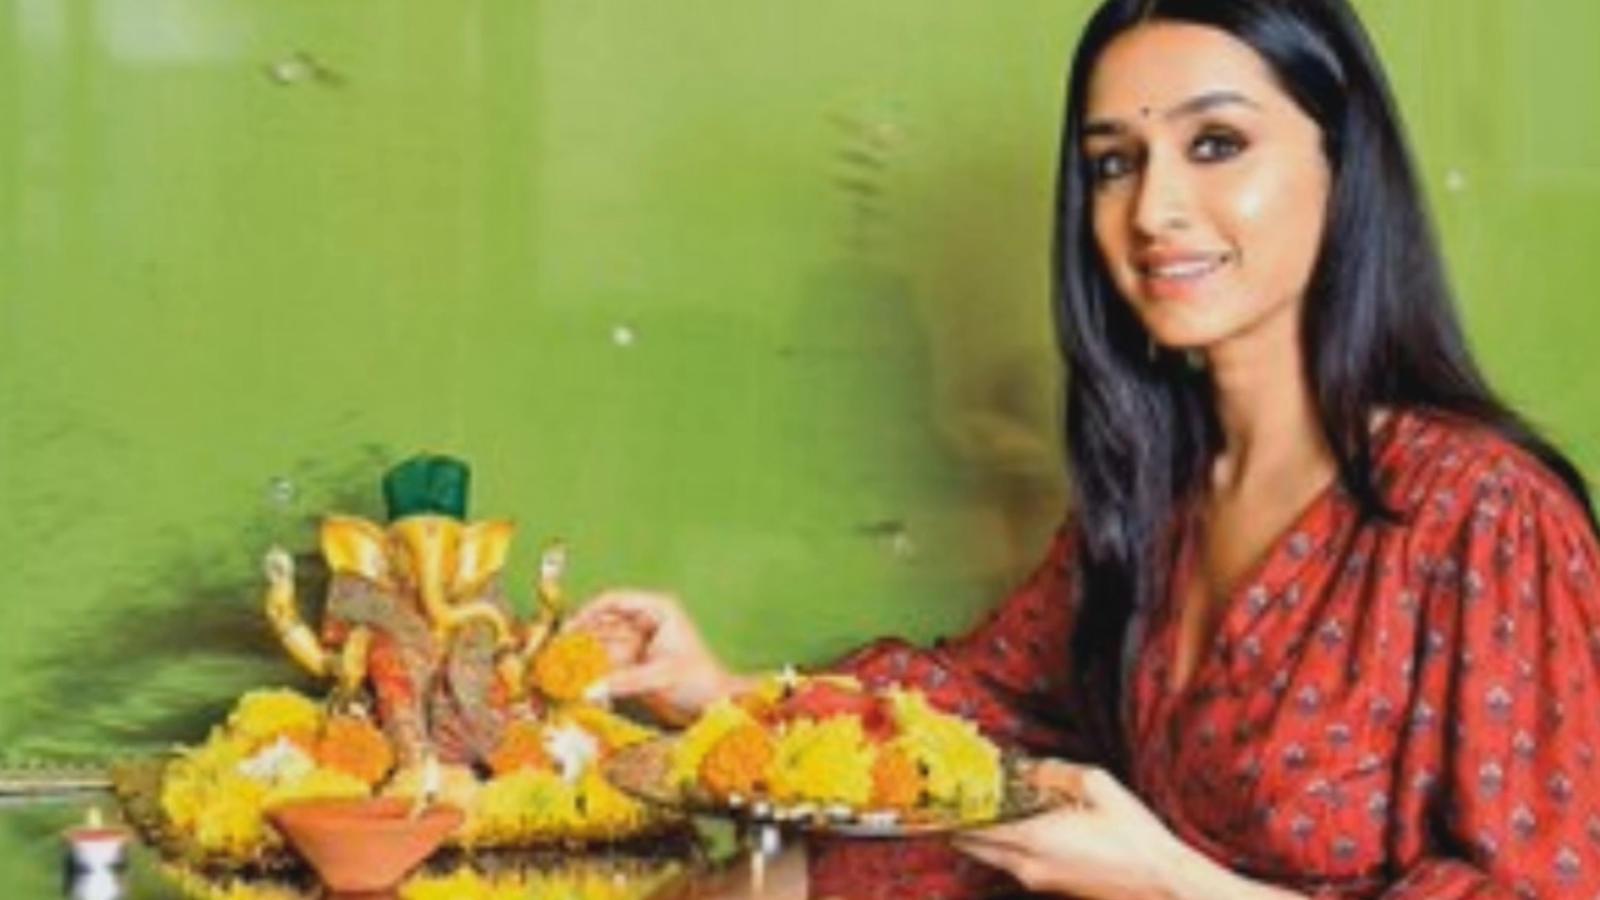 From Shraddha Kapoor to Nana Patekar, Bollywood celebs celebrate Ganesh Chaturthi